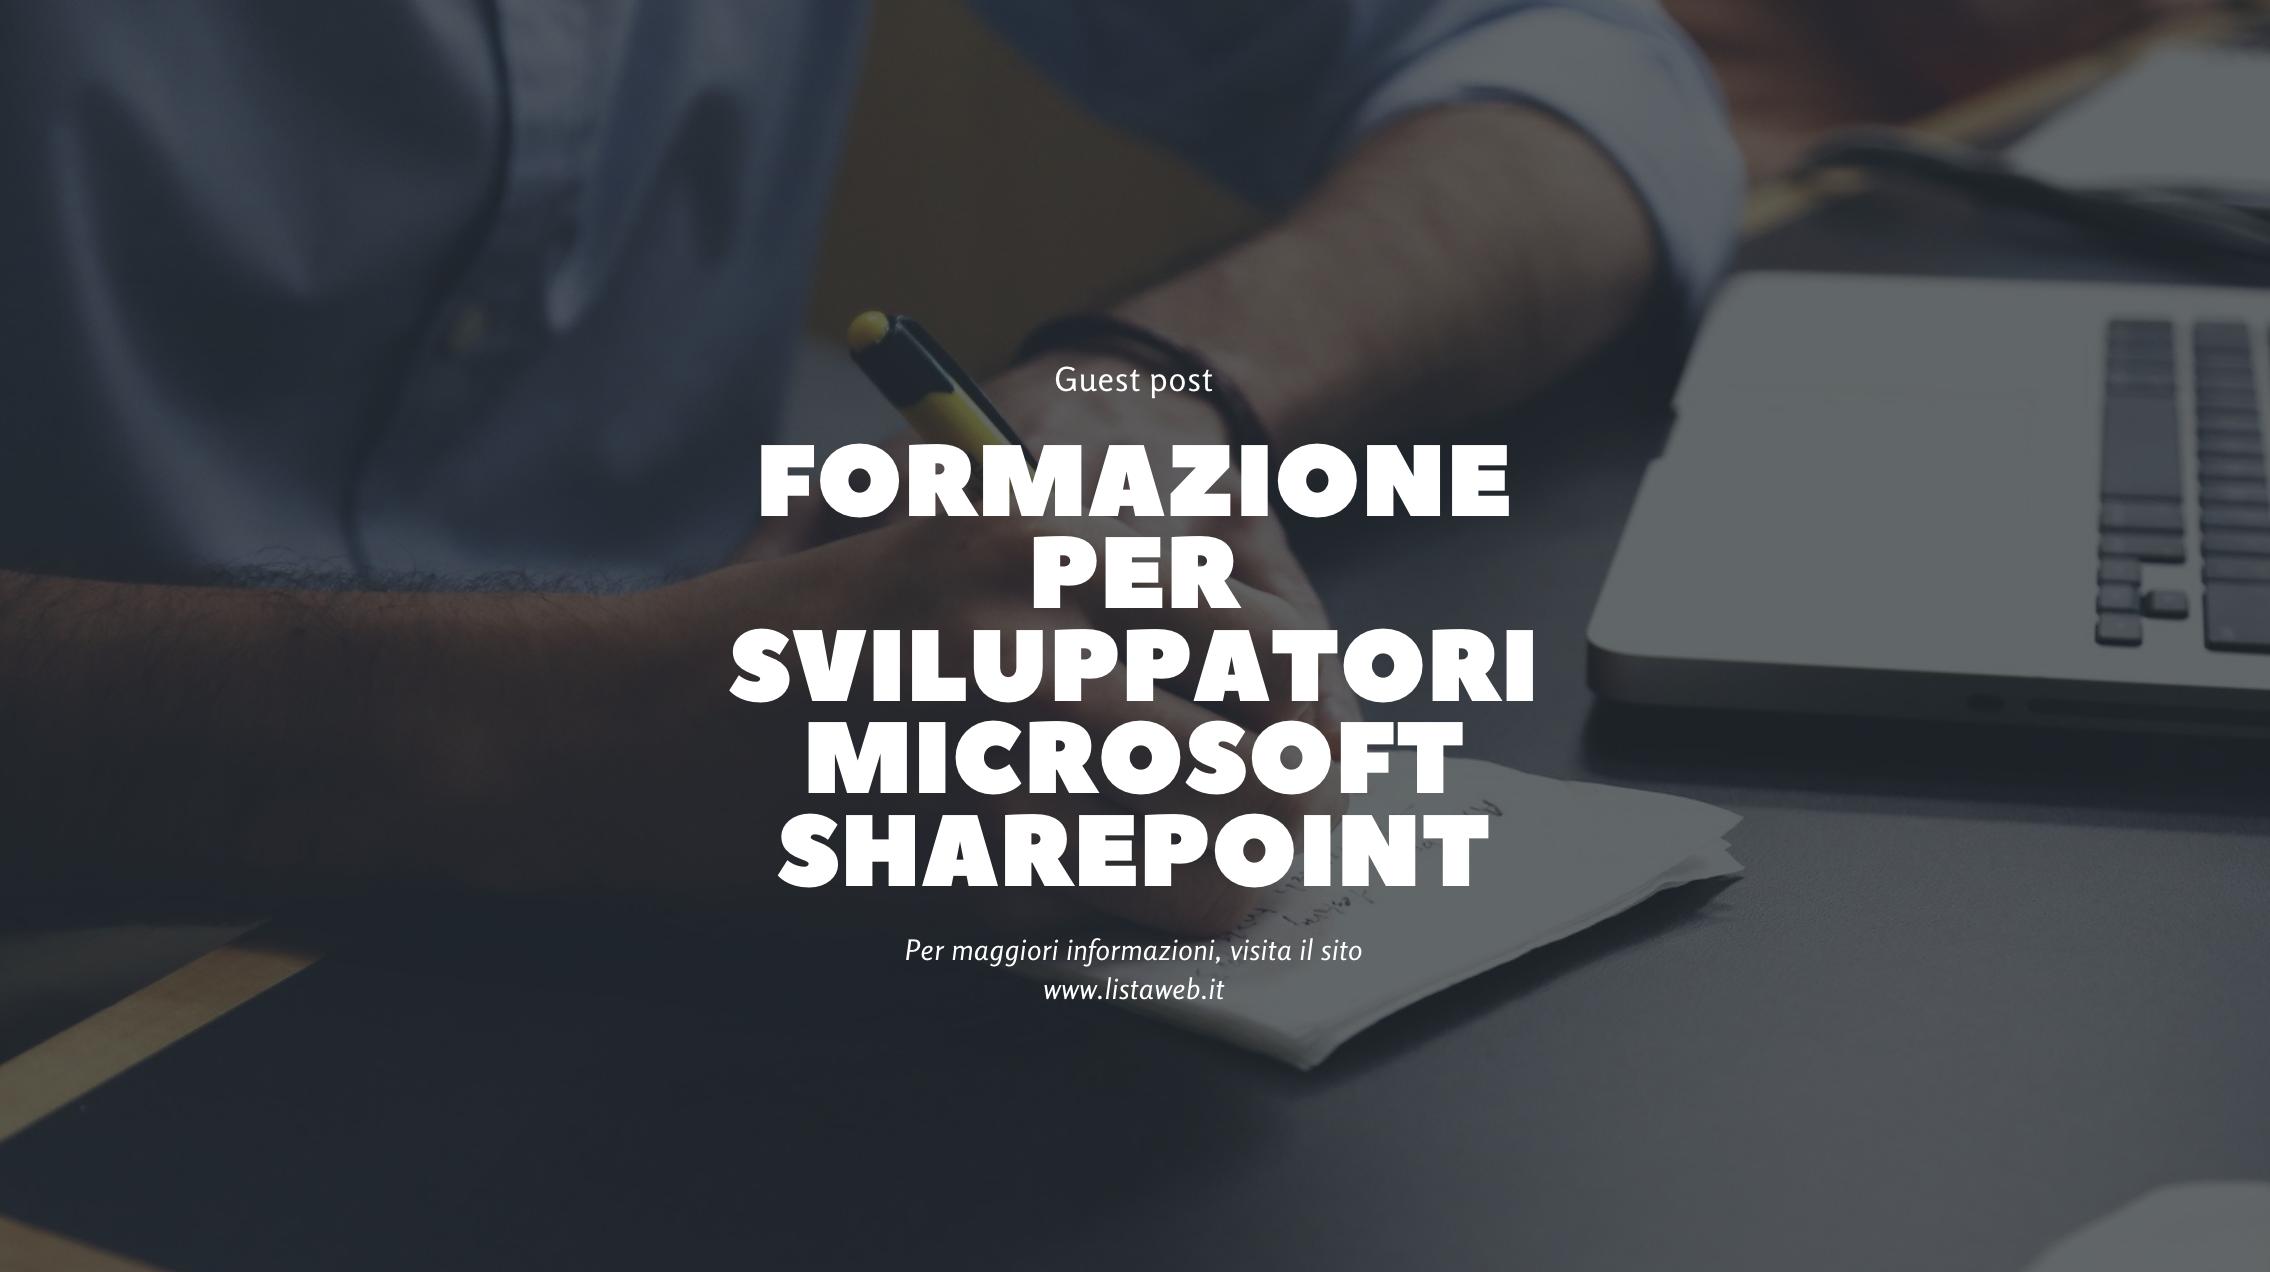 Formazione per sviluppatori Microsoft SharePoint